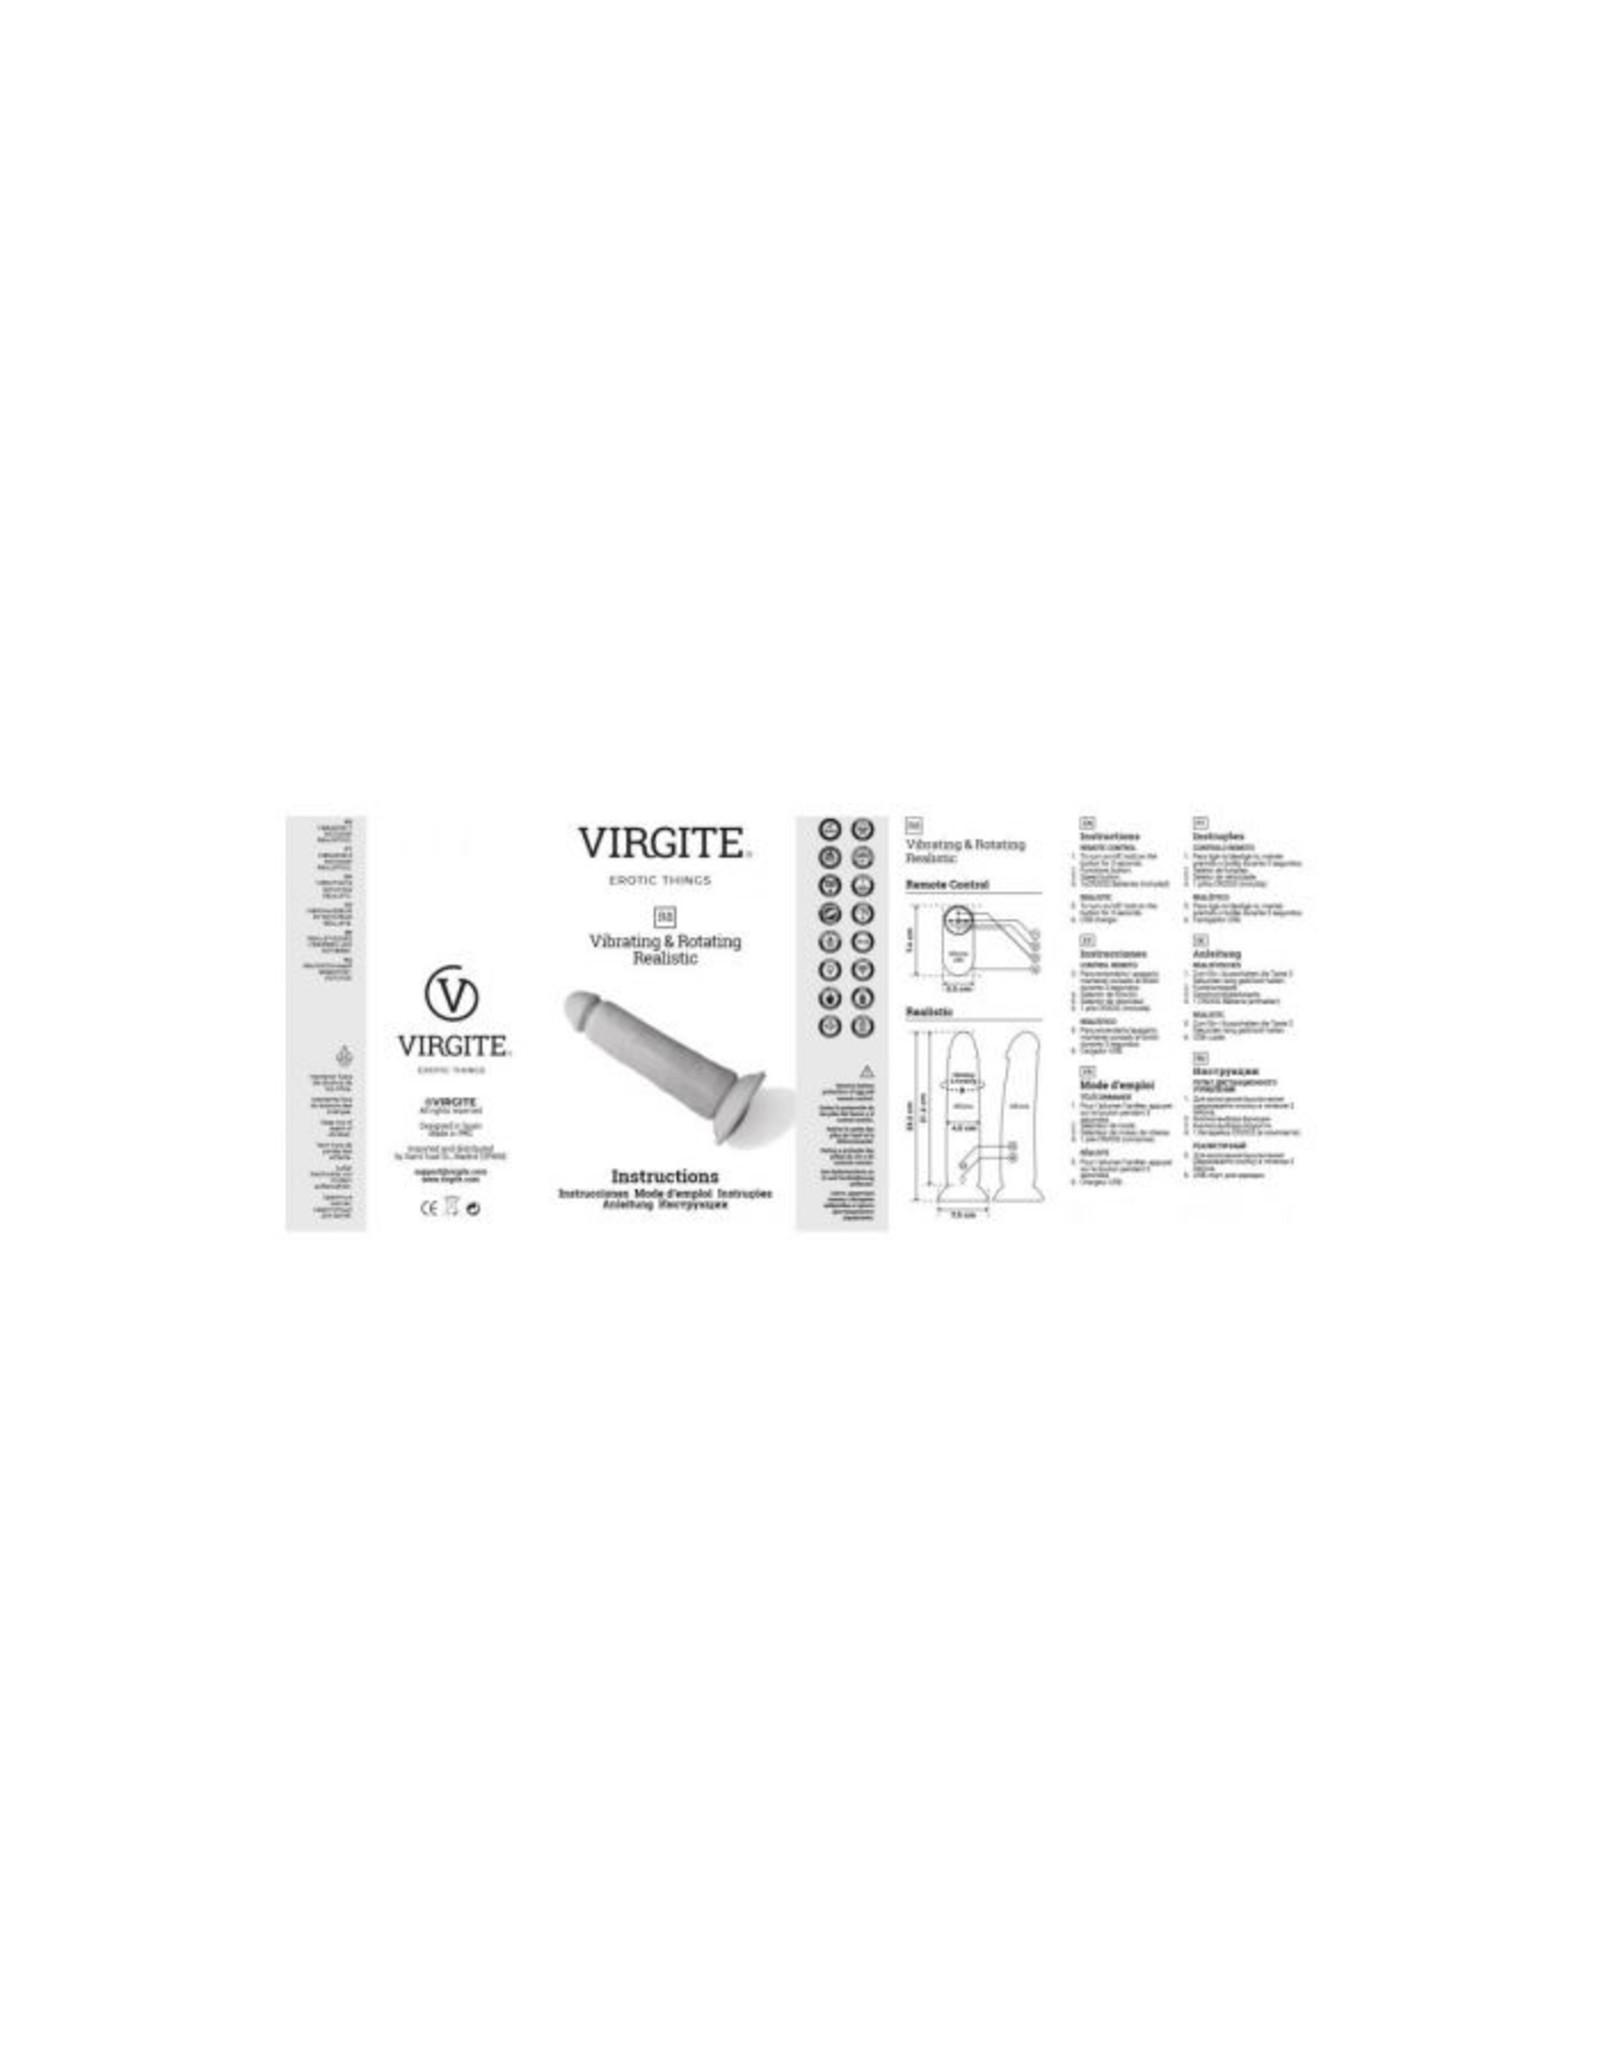 Virgite R8 vibrating & rotating realistic